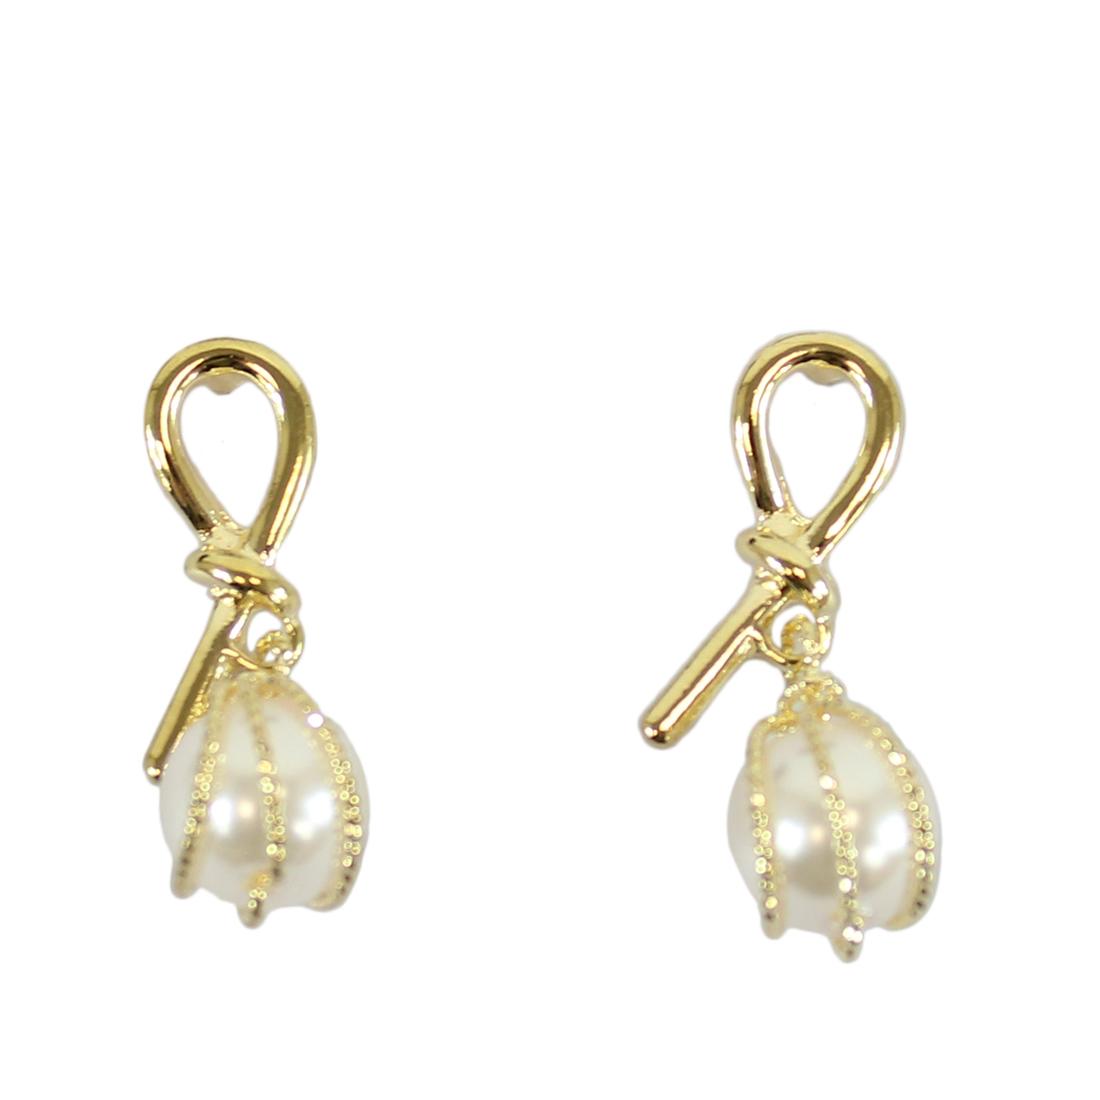 Elegant gold earrings with pearl